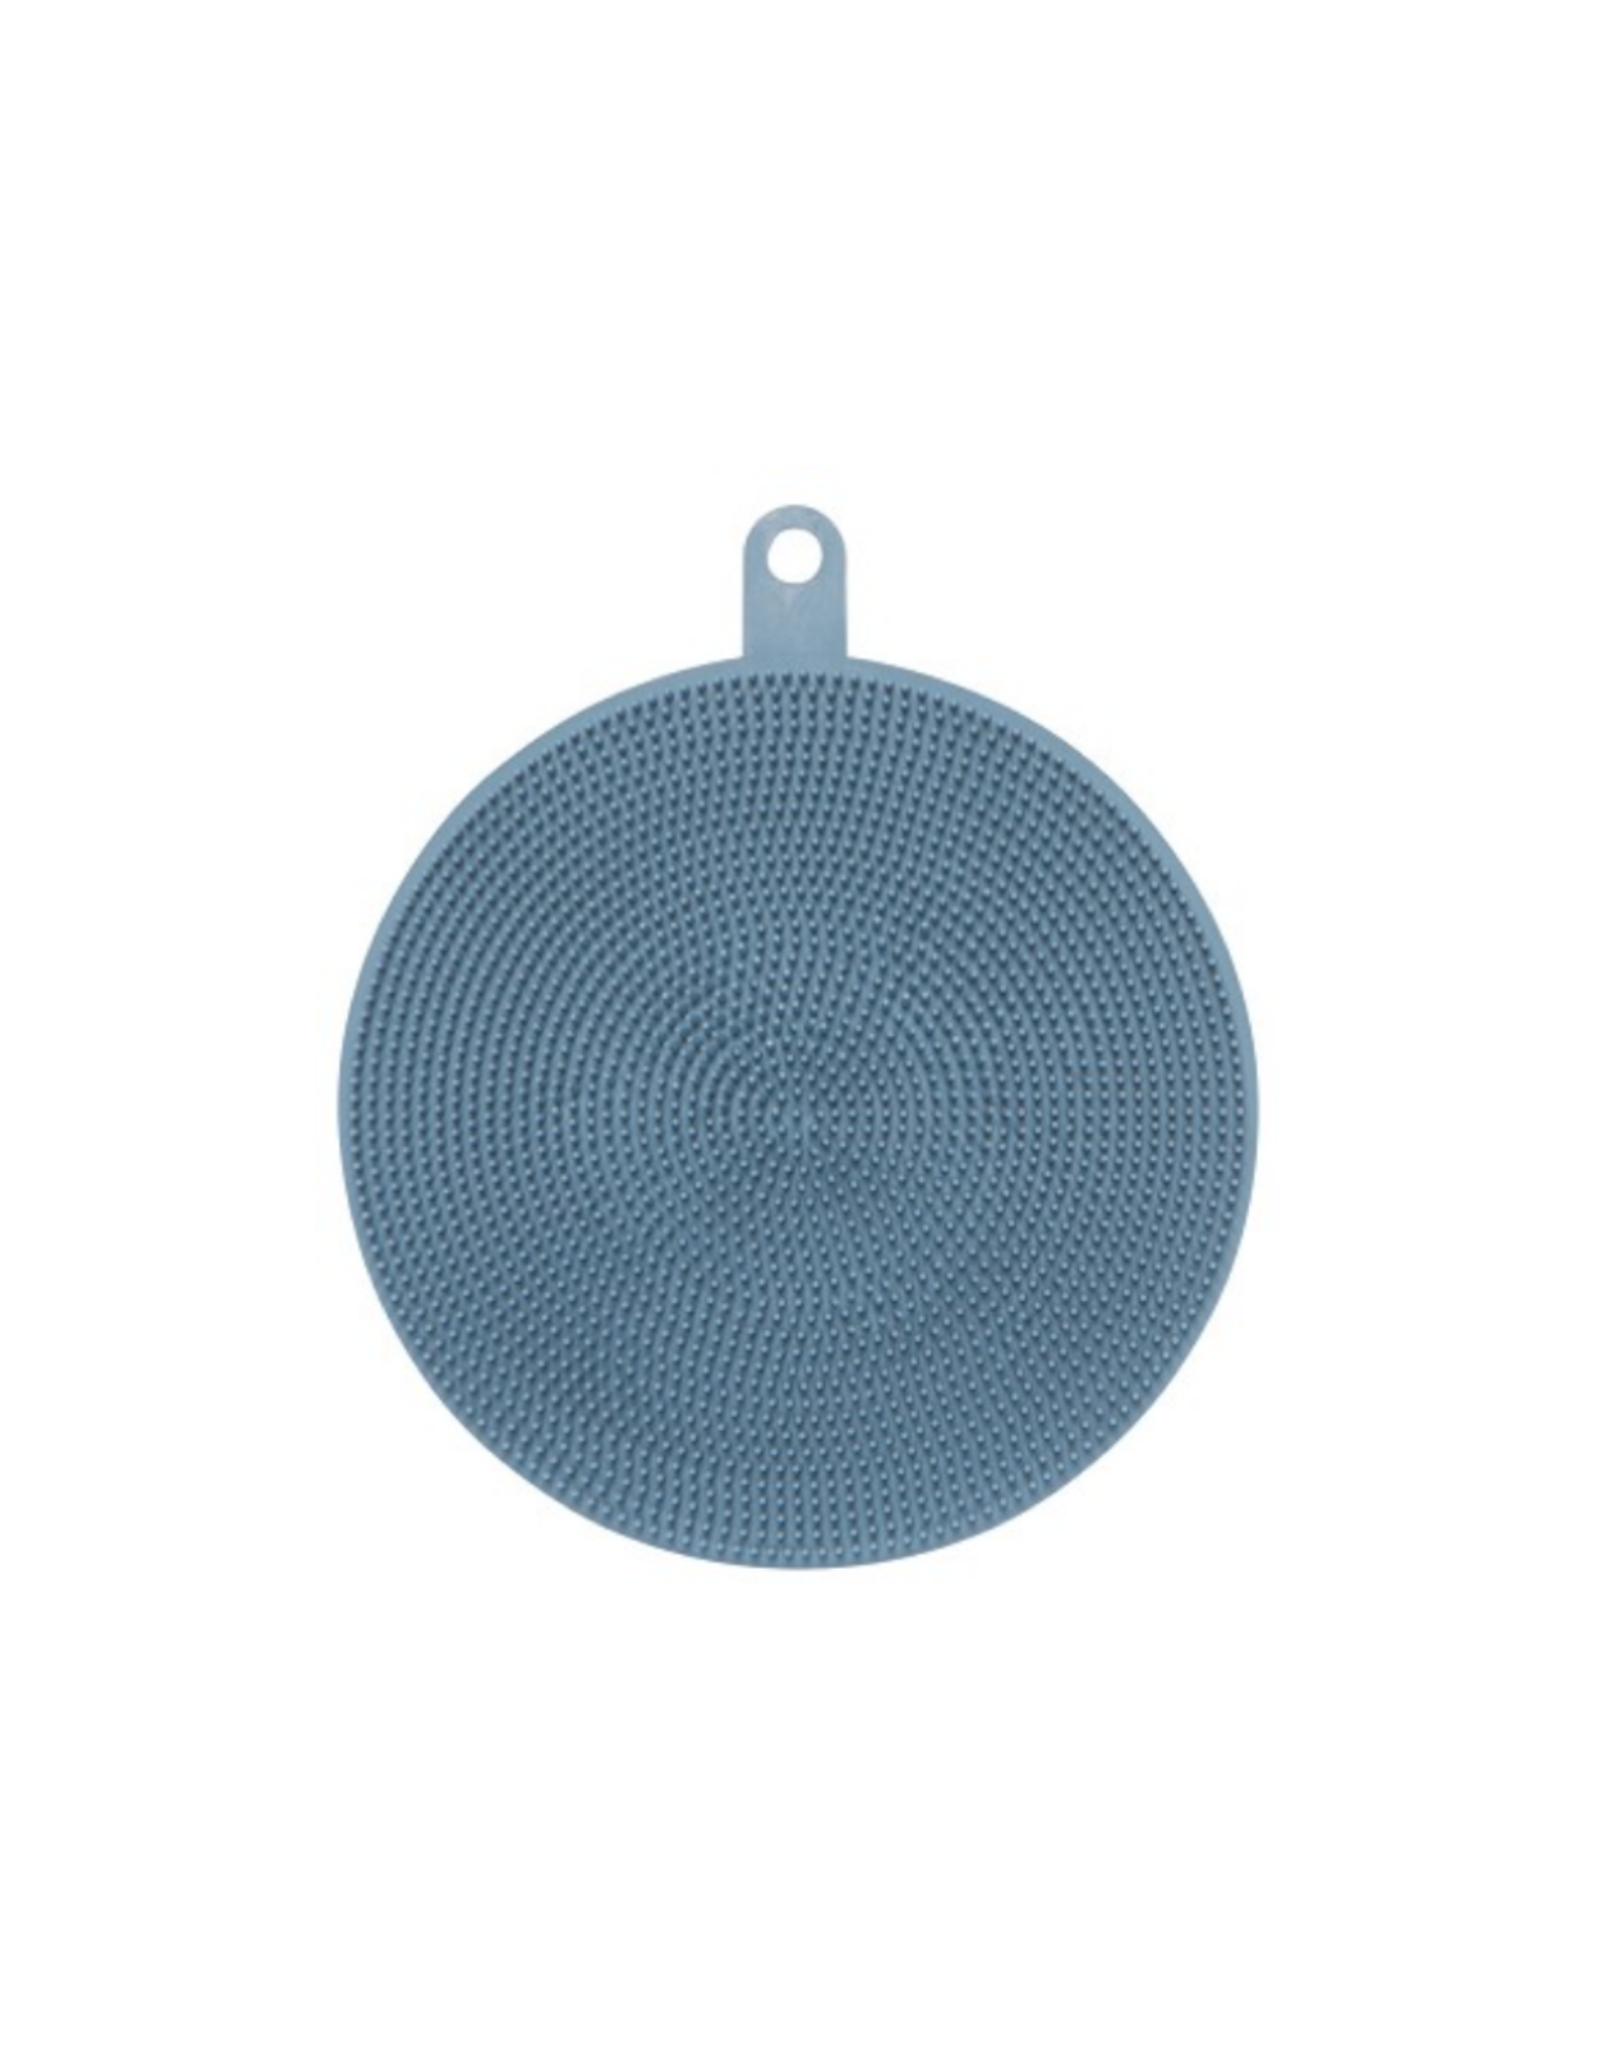 DCA - Scrub or Soap Rest / Silicone, Blue